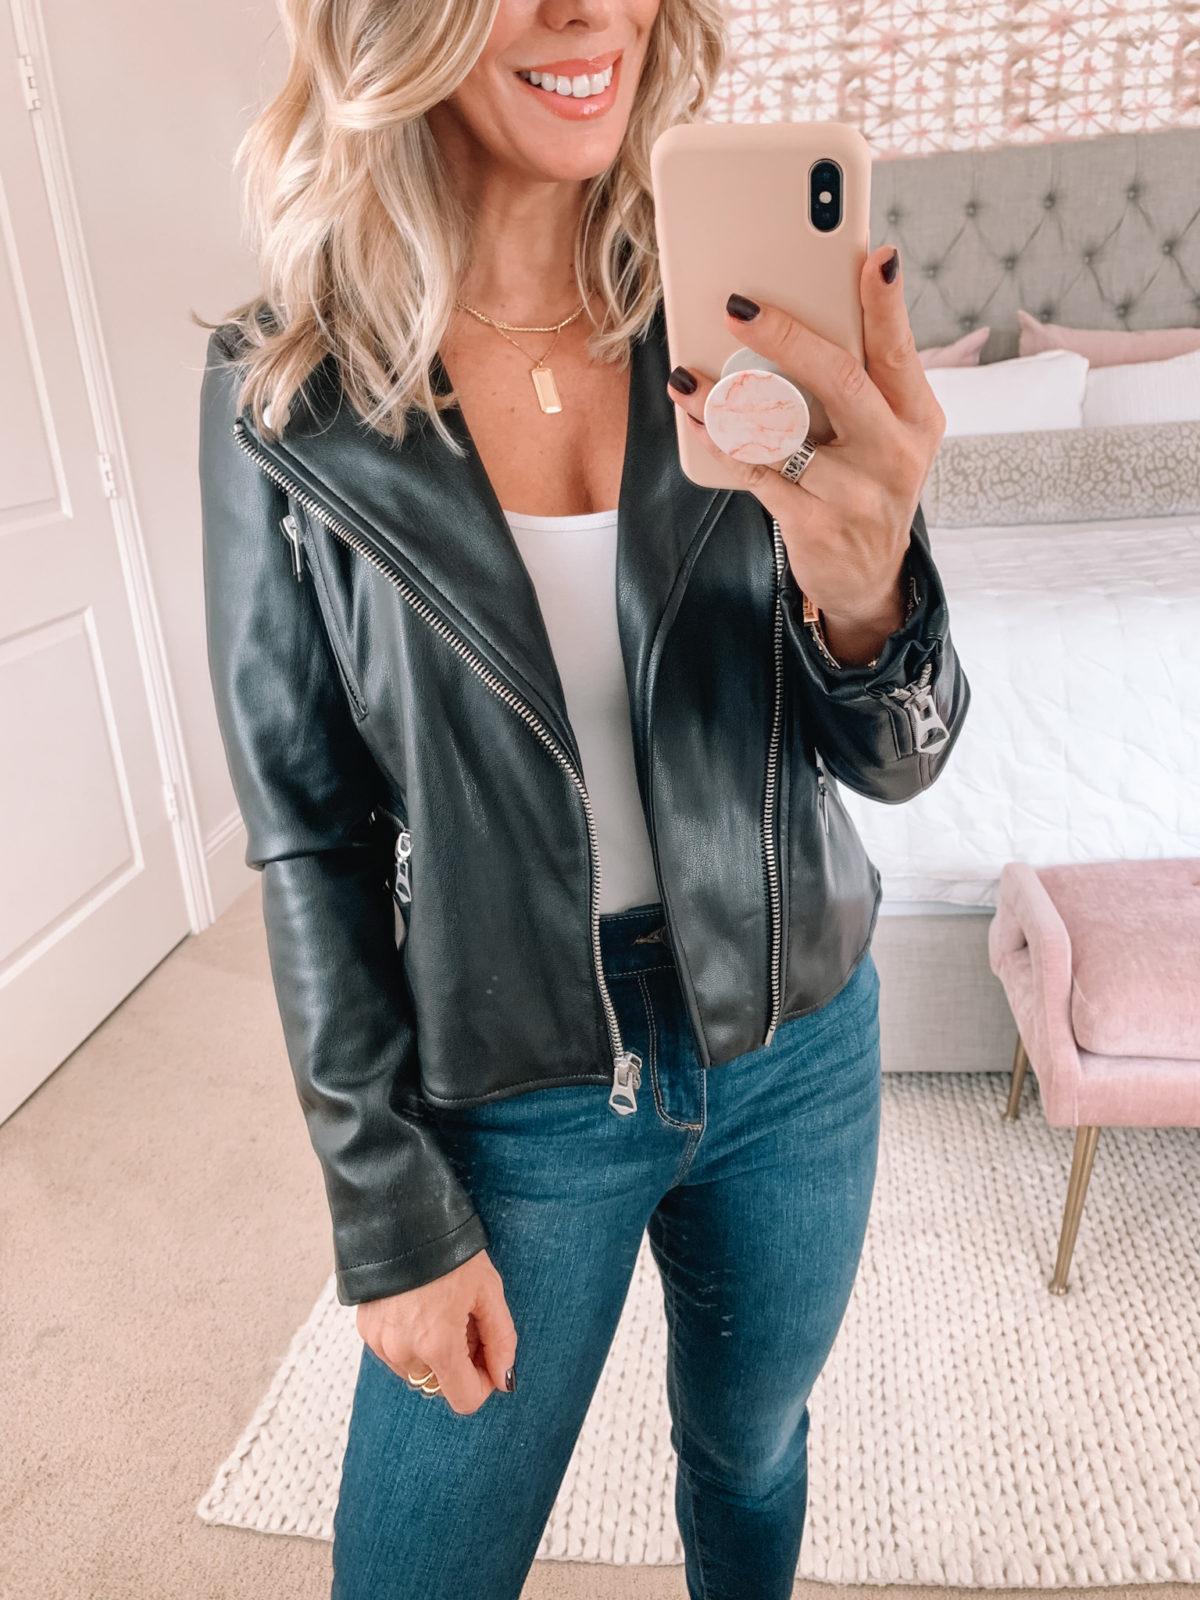 Walmart Fashion, Vegan leather Moto Jacket, SKinny Jeans, Snakeskin Booties